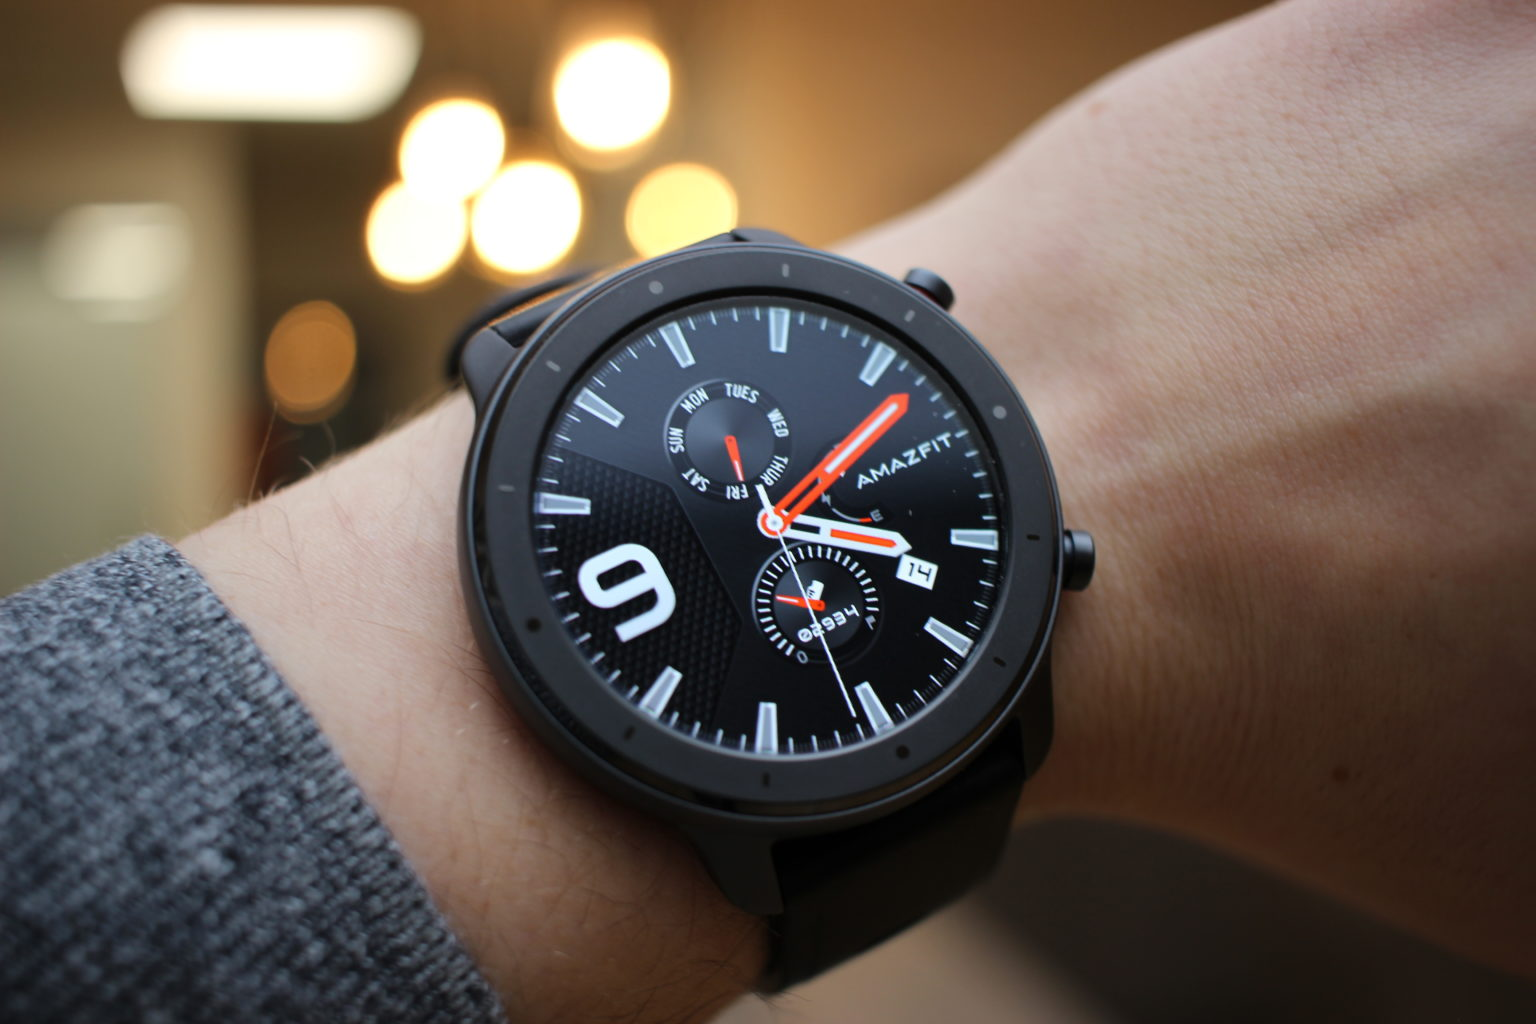 Reloj Inteligente Amazfit GTR Lite en la muñeca